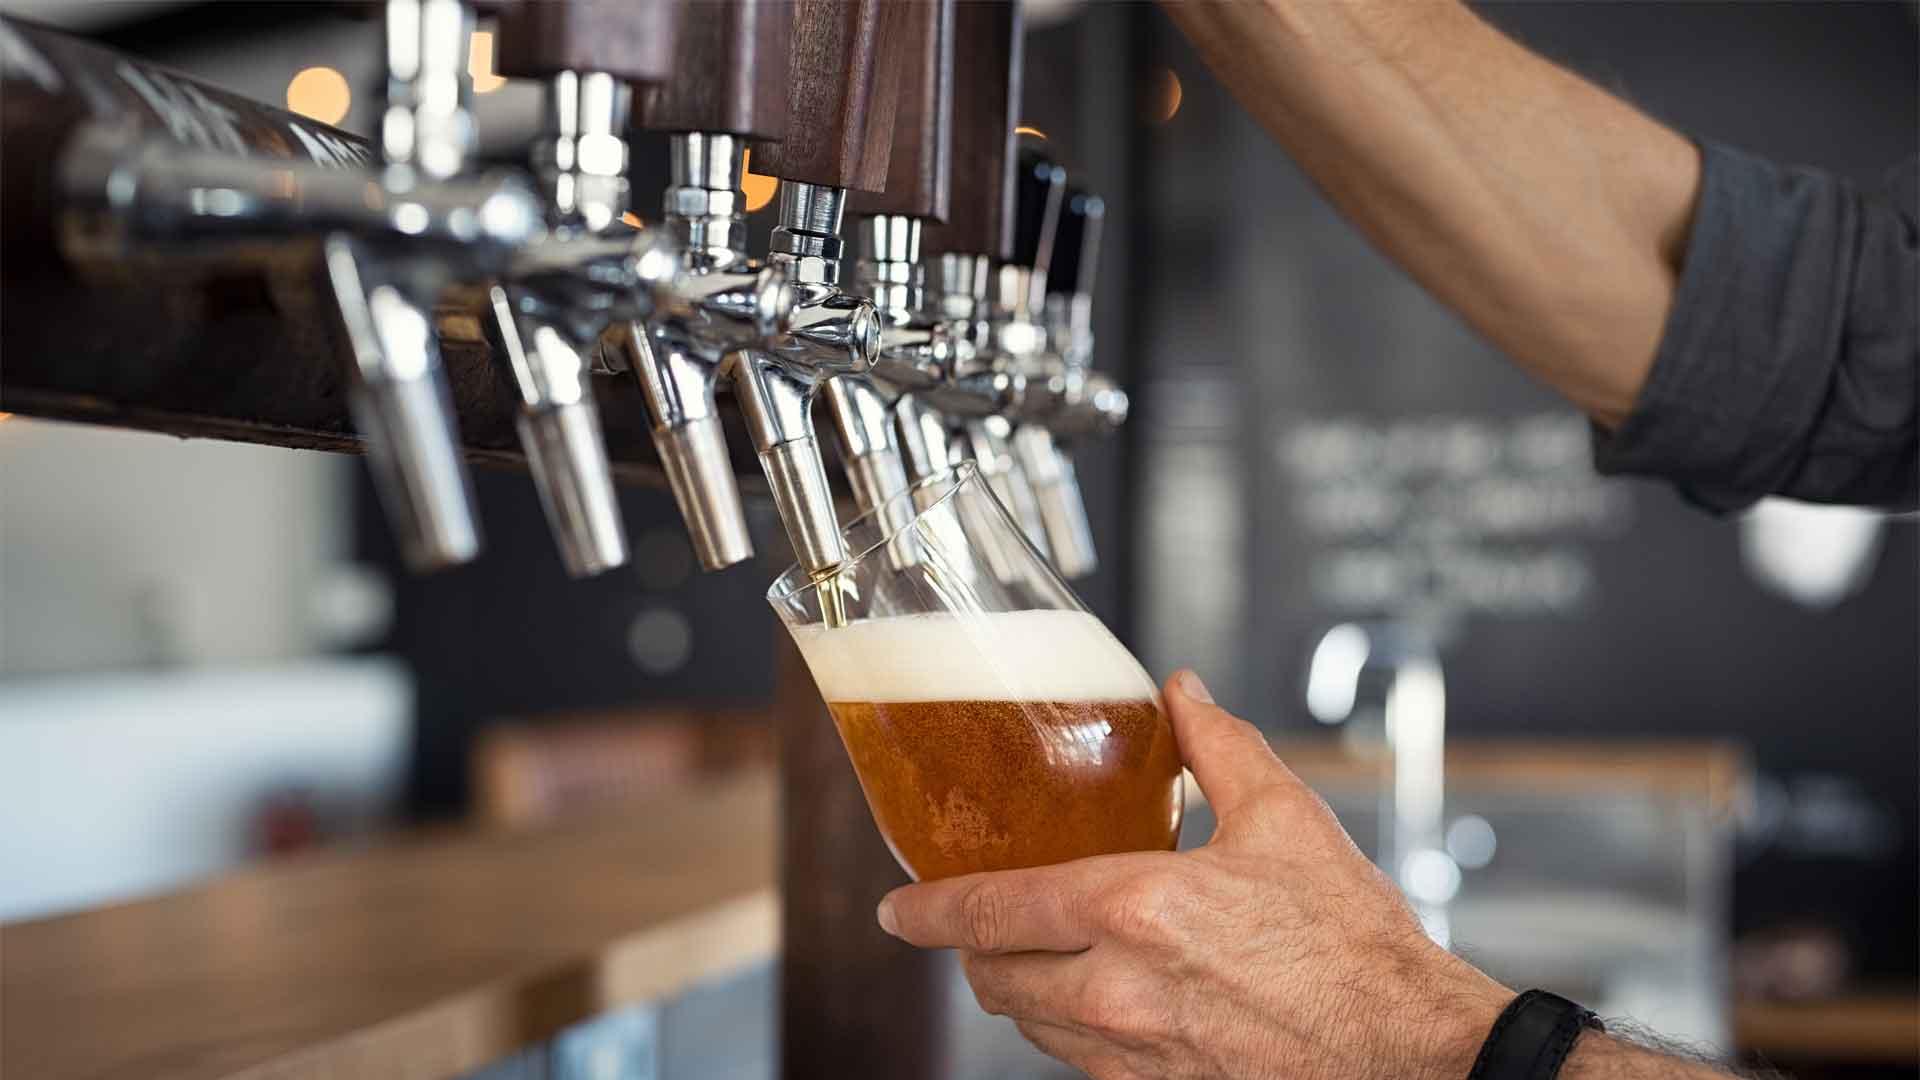 HOP Speakeasy, secreto cervecero a voces